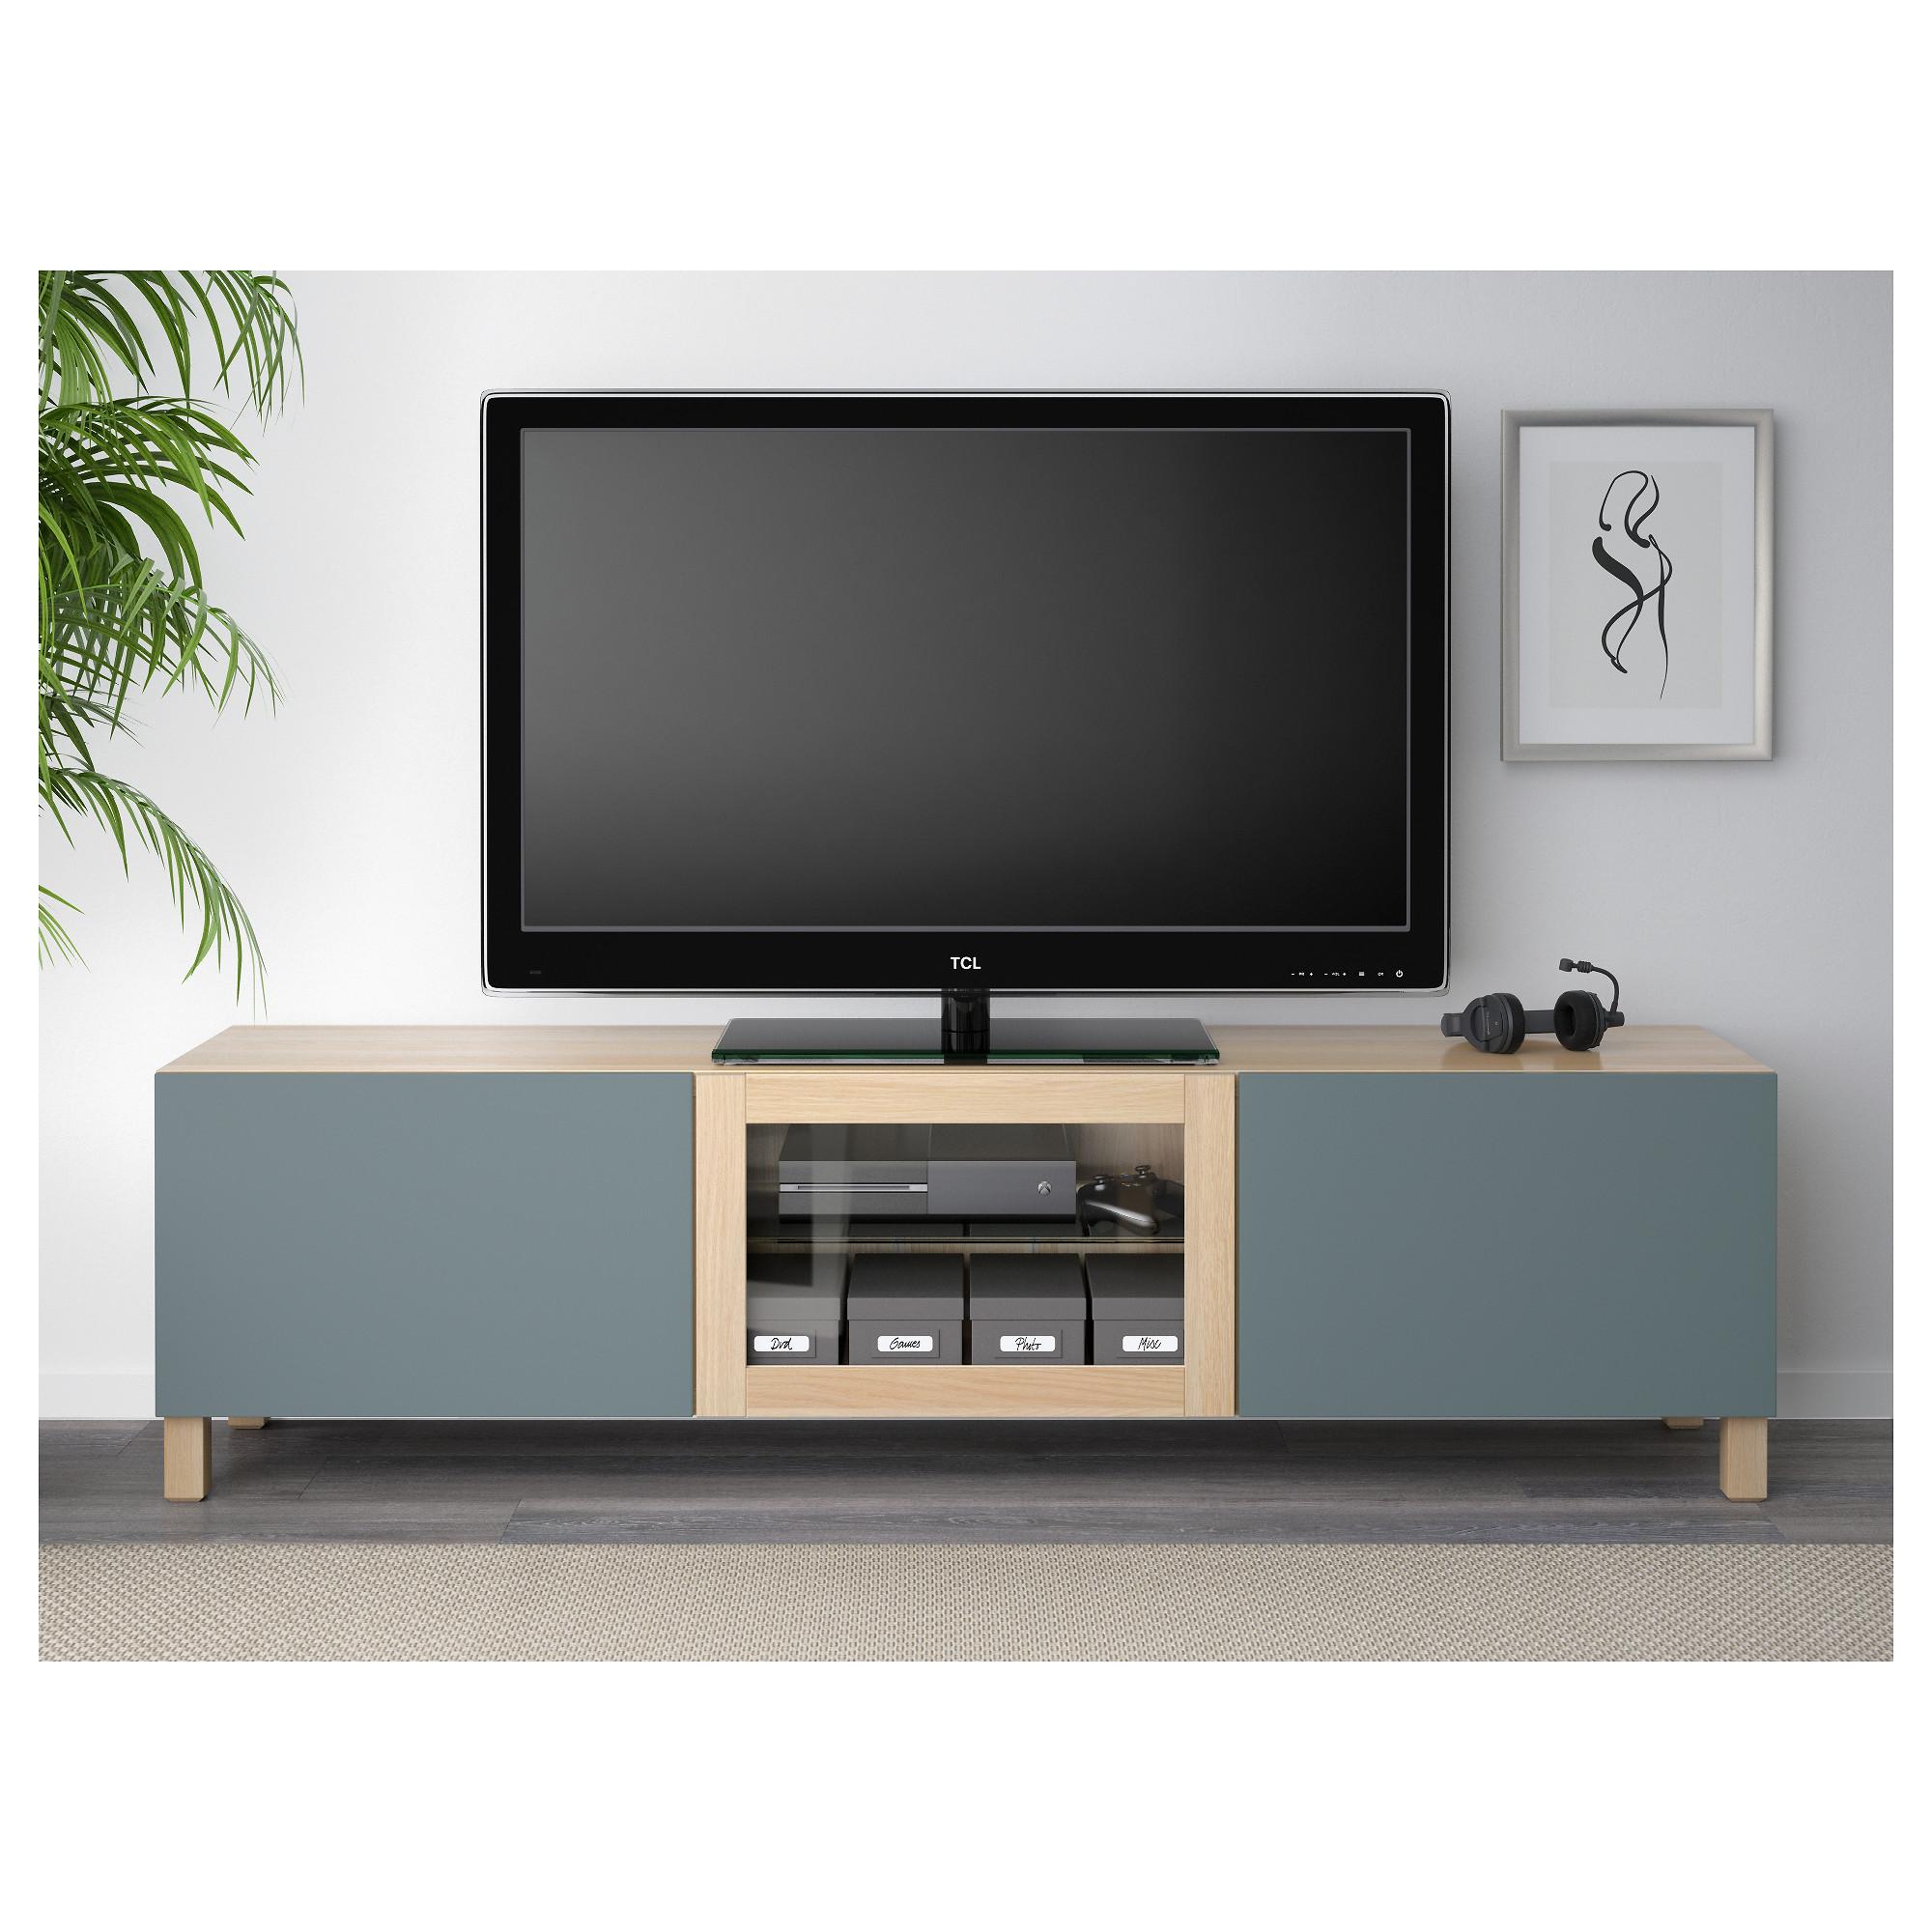 Тумба под ТВ с ящиками и дверцей БЕСТО артикуль № 792.506.99 в наличии. Online каталог IKEA РБ. Недорогая доставка и установка.